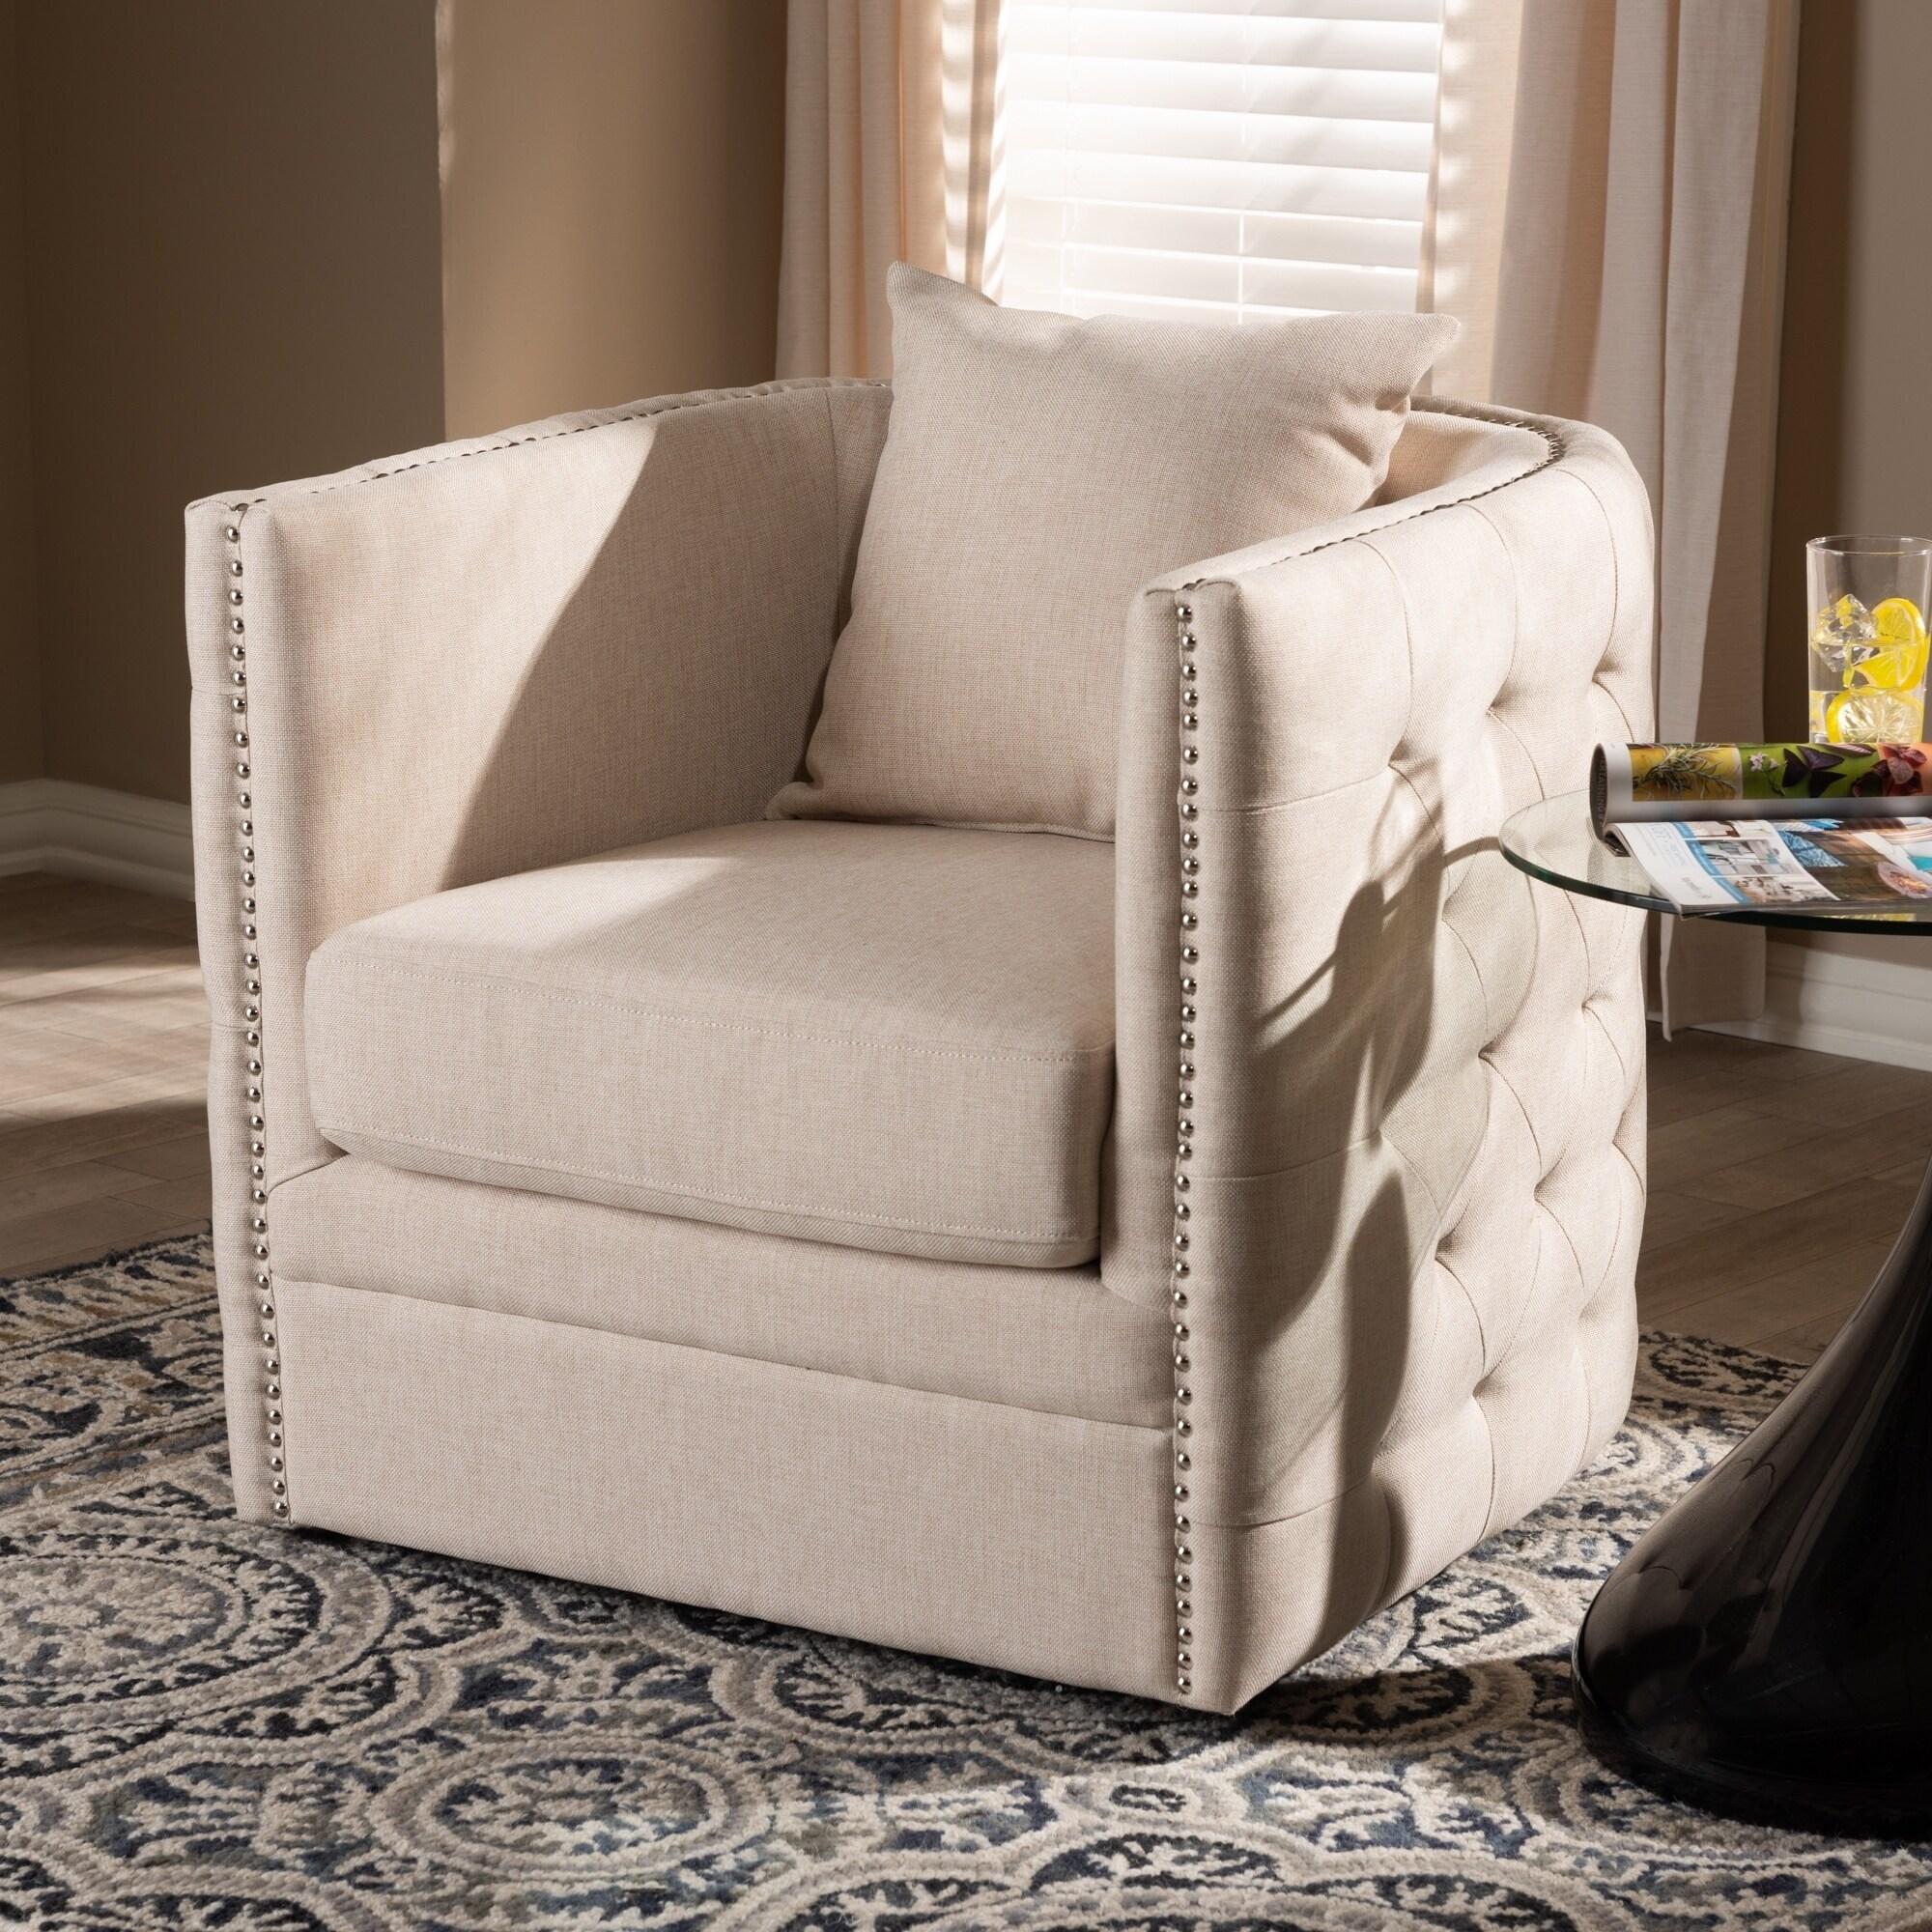 Awe Inspiring Contemporary Fabric Swivel Chair Bralicious Painted Fabric Chair Ideas Braliciousco